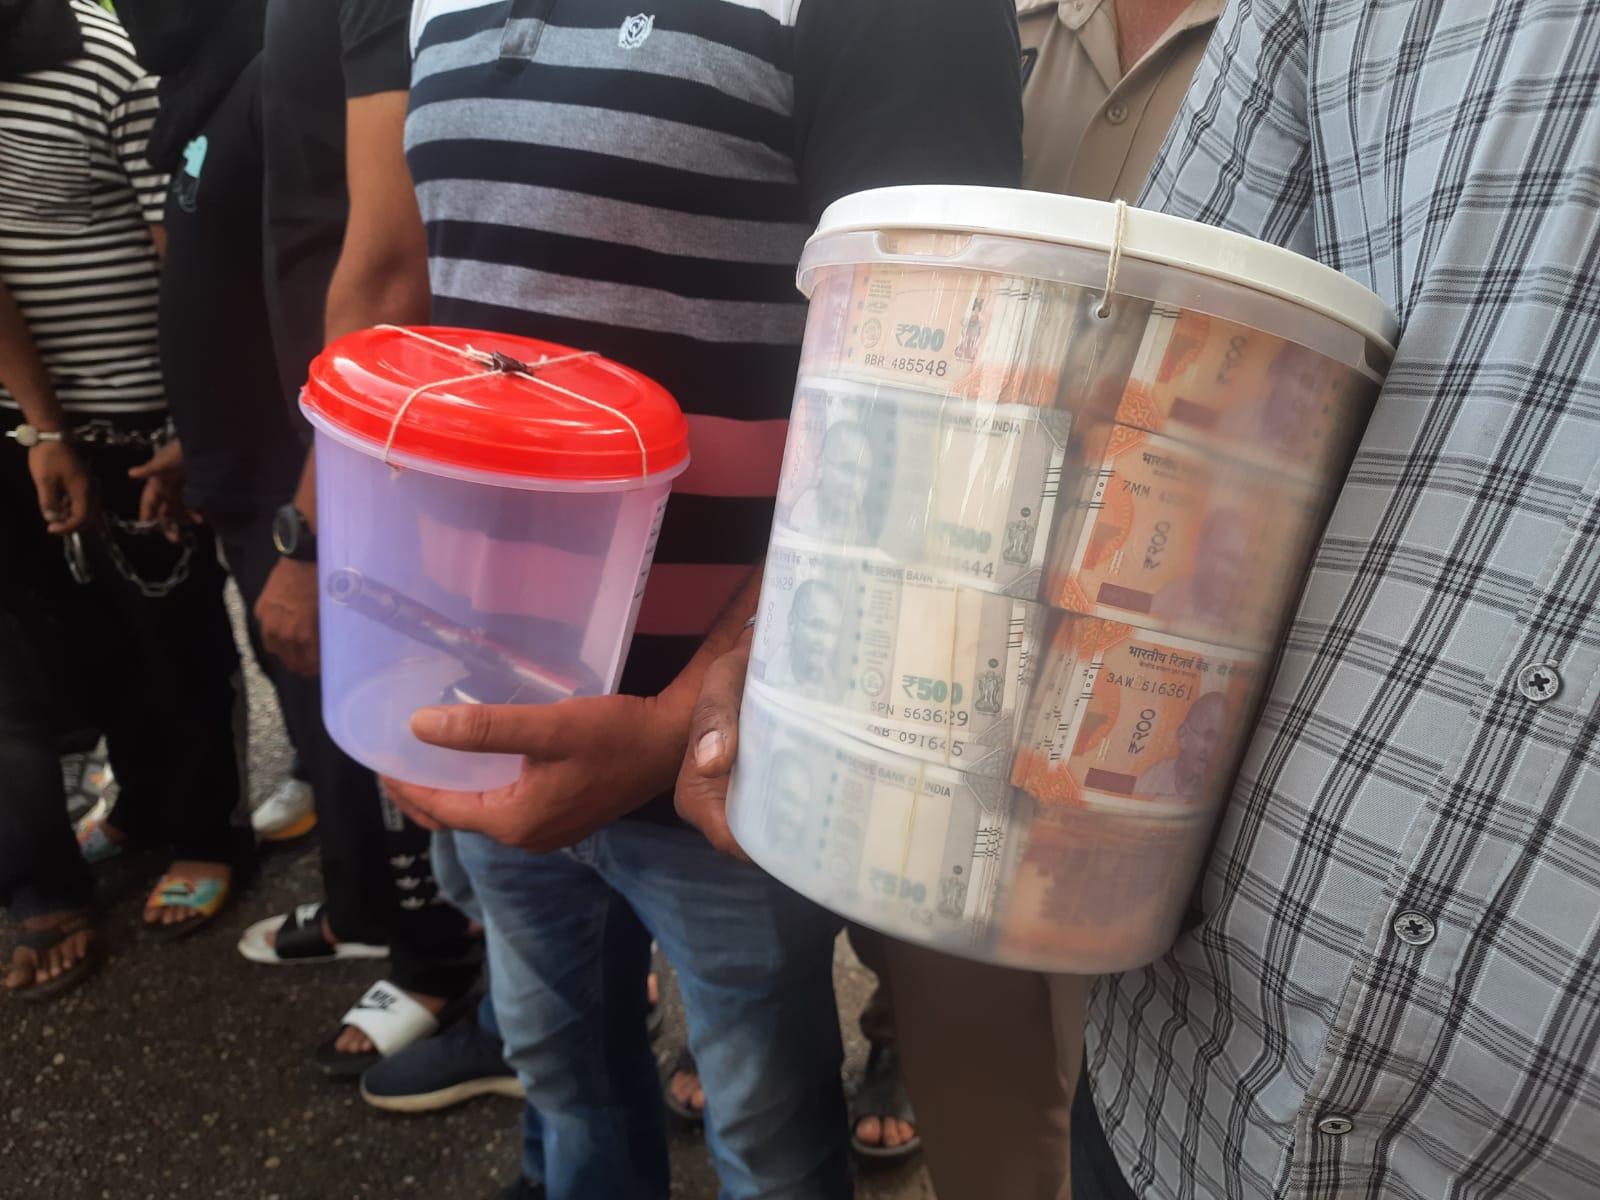 5 kg of heroin seized